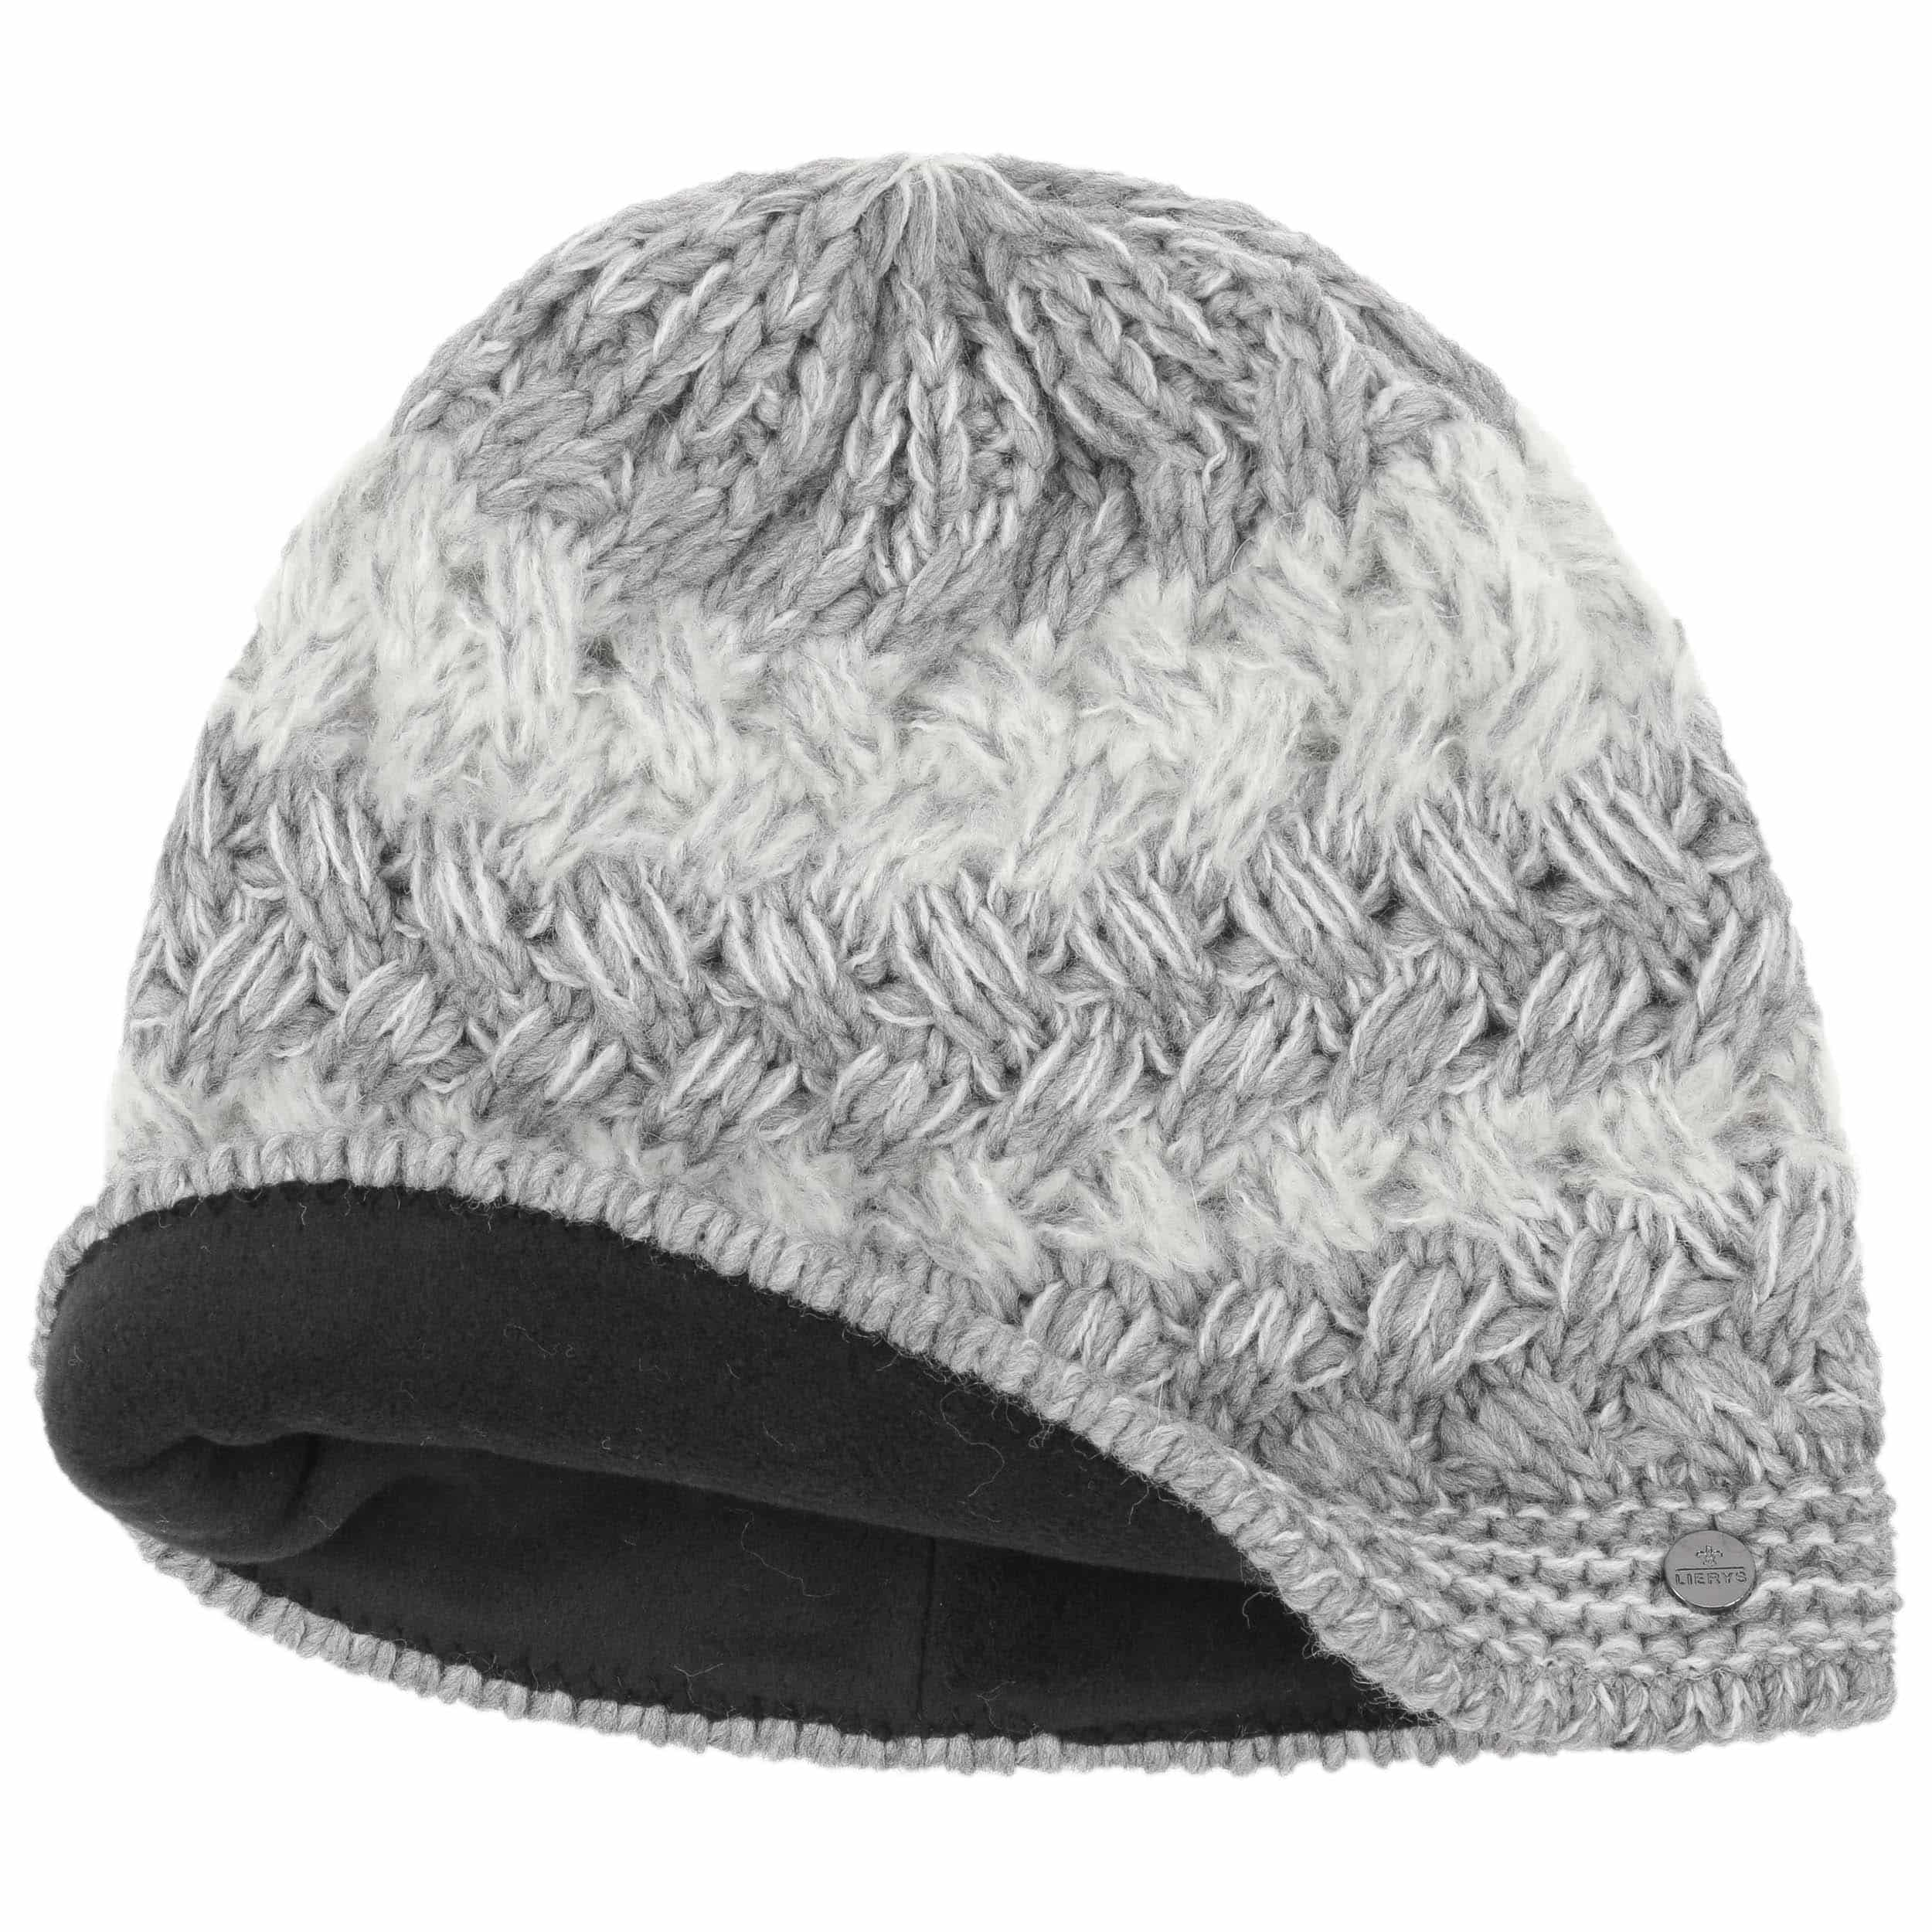 My-Mohair Knit Hat by Lierys Cloth hats Lierys QzBAgi